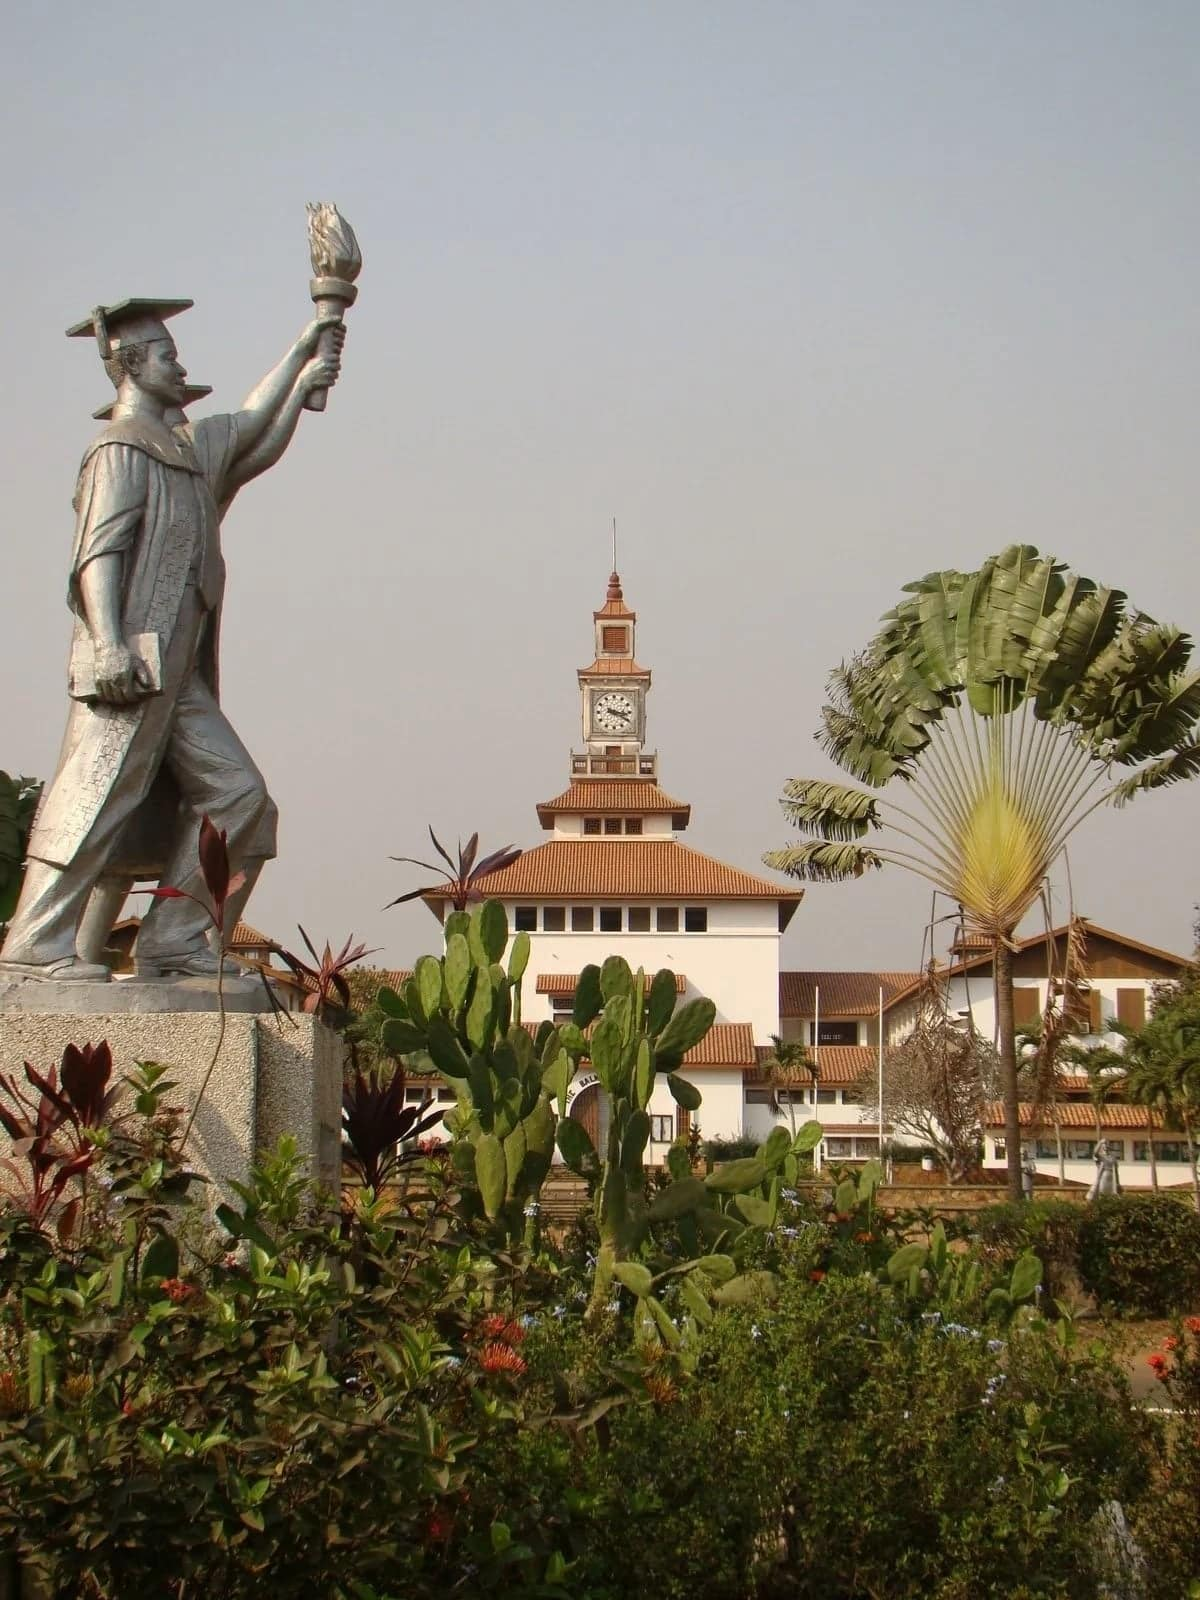 University of Ghana admissions